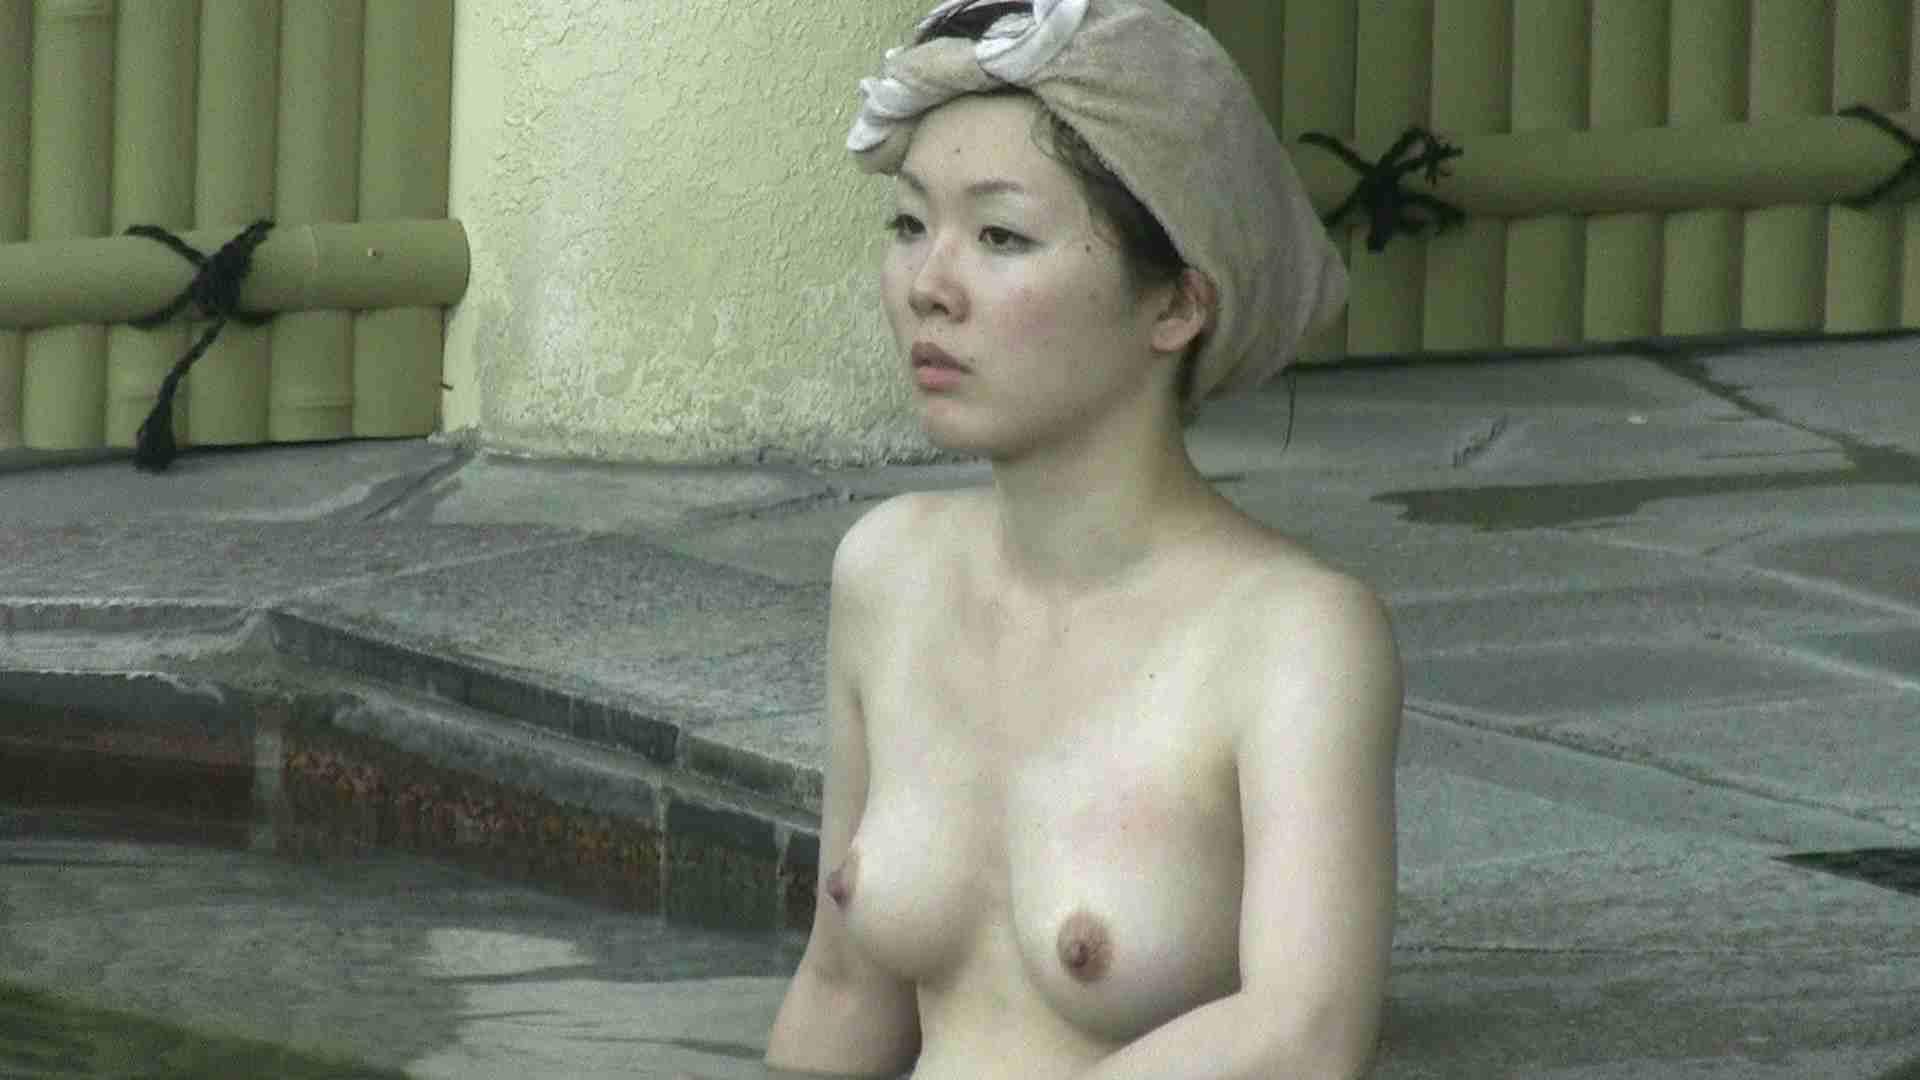 Aquaな露天風呂Vol.191 HなOL | 露天  65pic 40